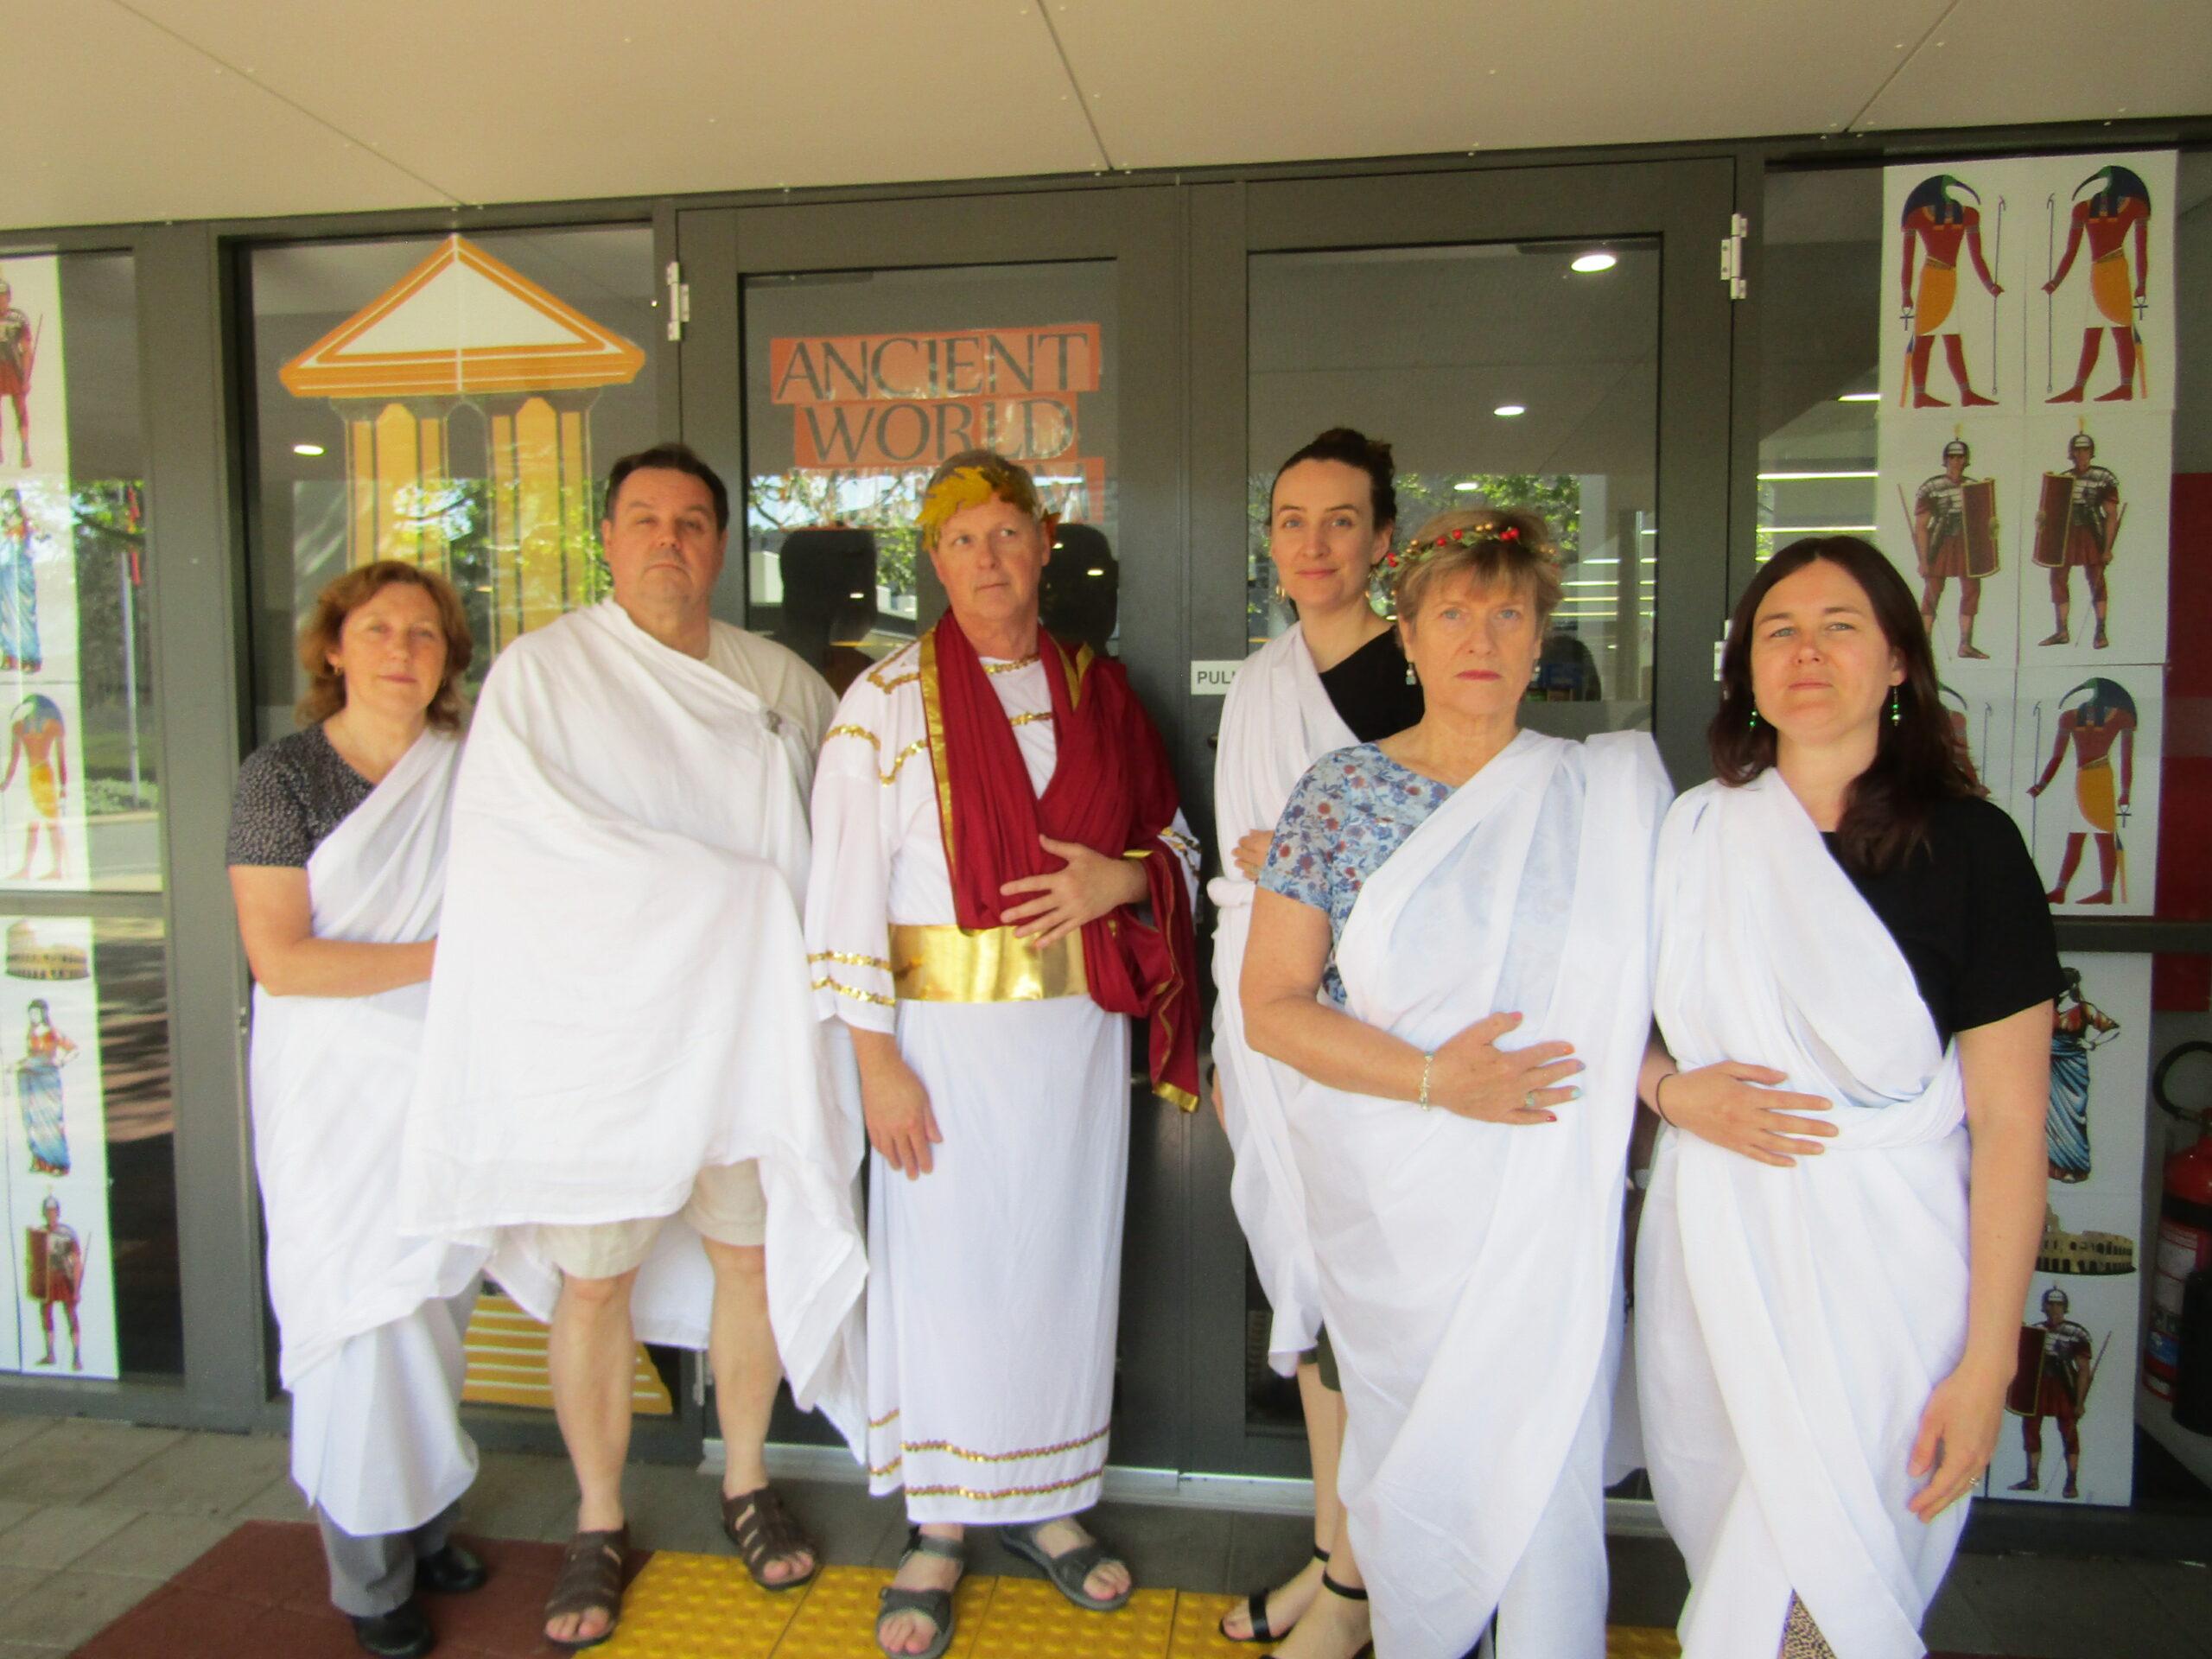 AWM - RASC staff dressed up!